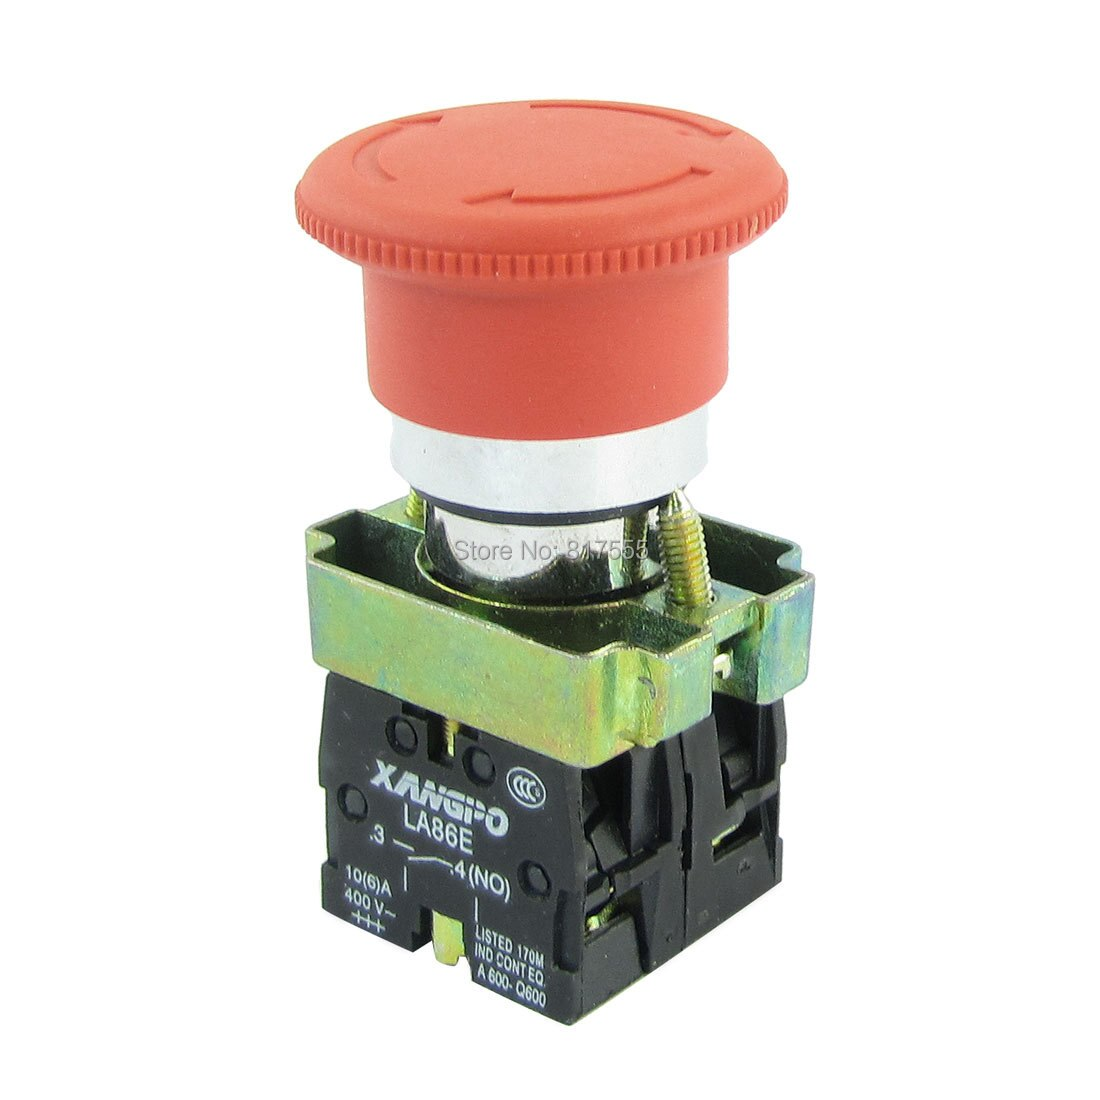 Cabeza de seta roja 4-Terminal 1NC + 1NO interruptor de botón de emergencia AC 400 V 10 a diámetro